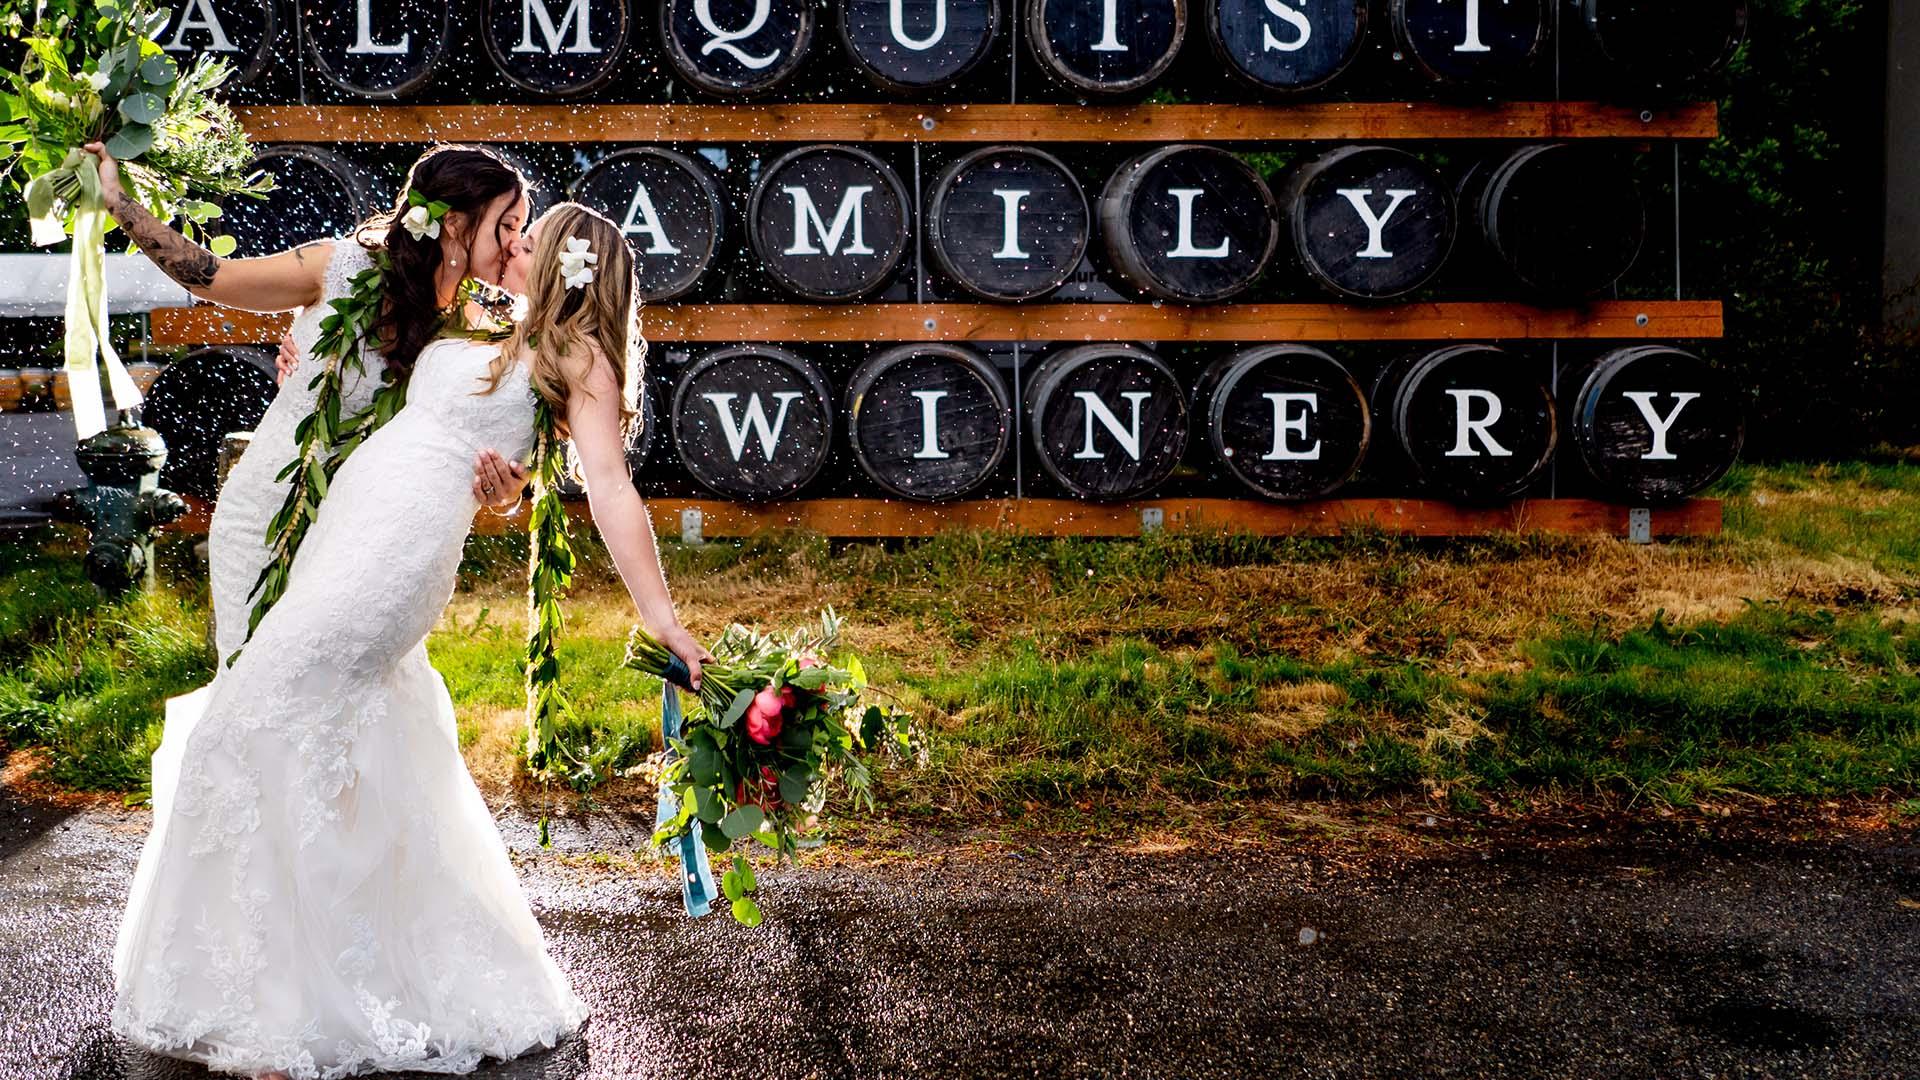 seattle rainy wedding photos seattle wedding photographers salt and pine featured